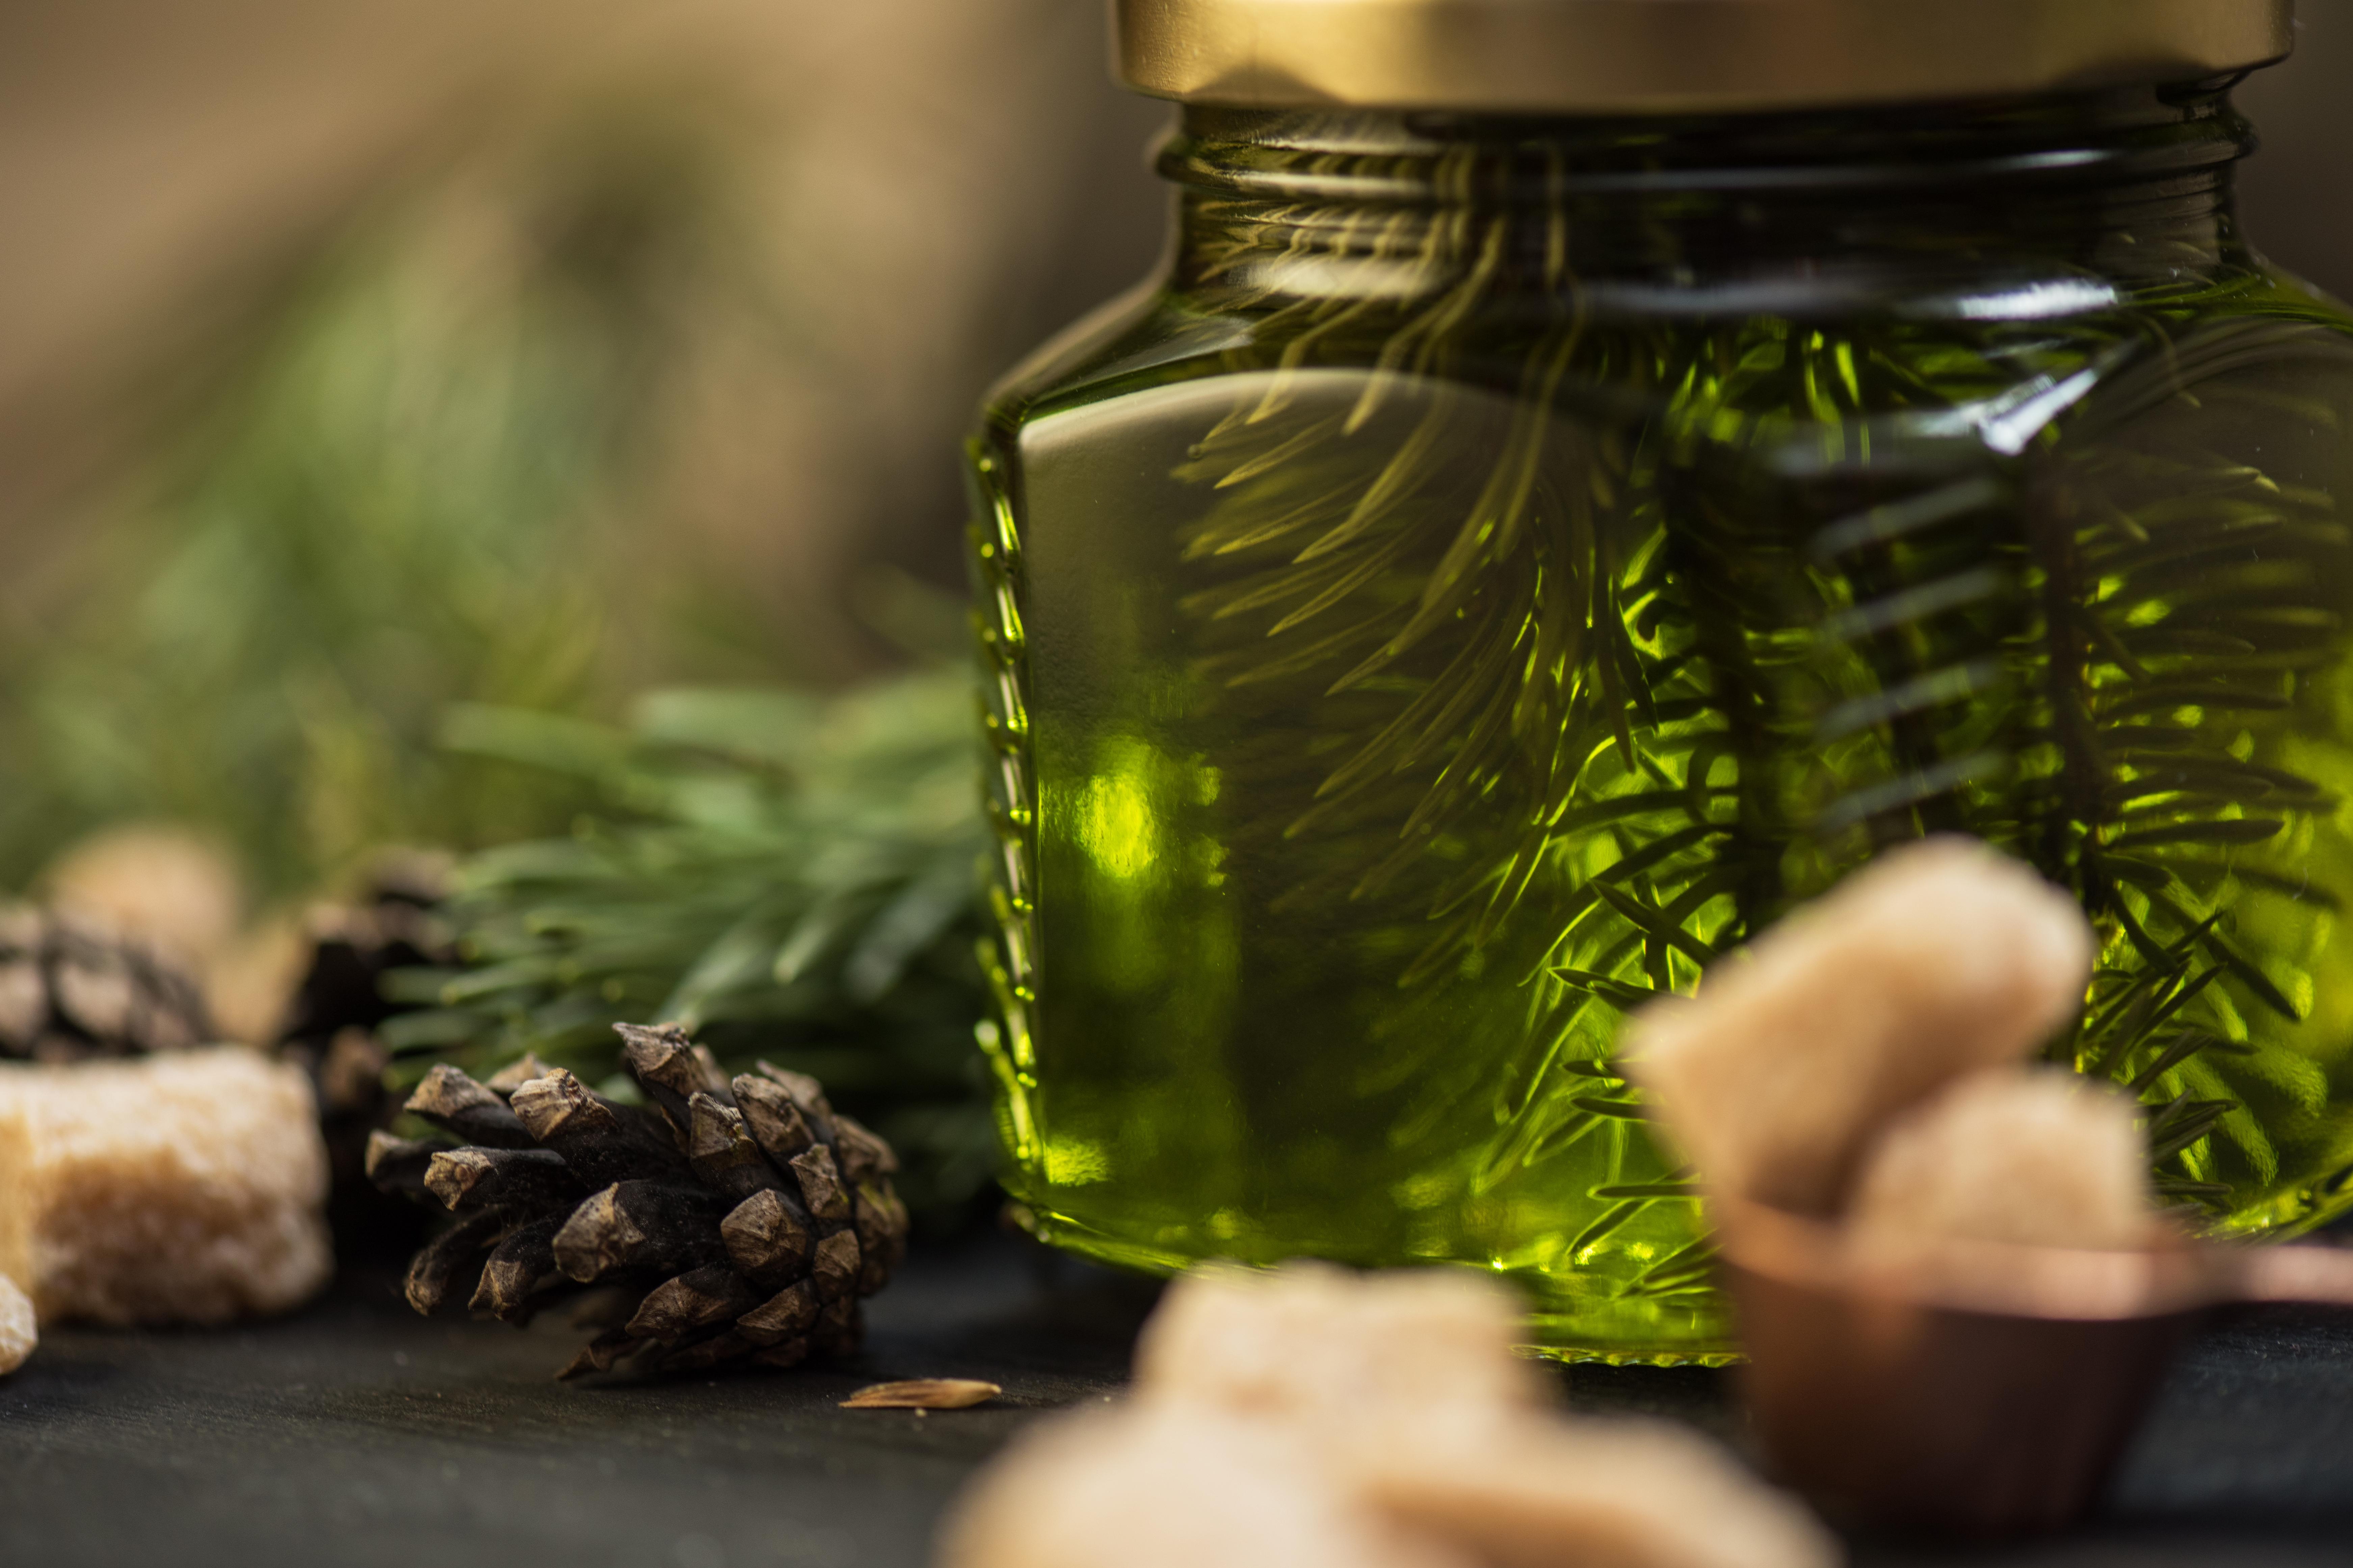 pine elka hvoya shishka green zeleniy eliksir extract